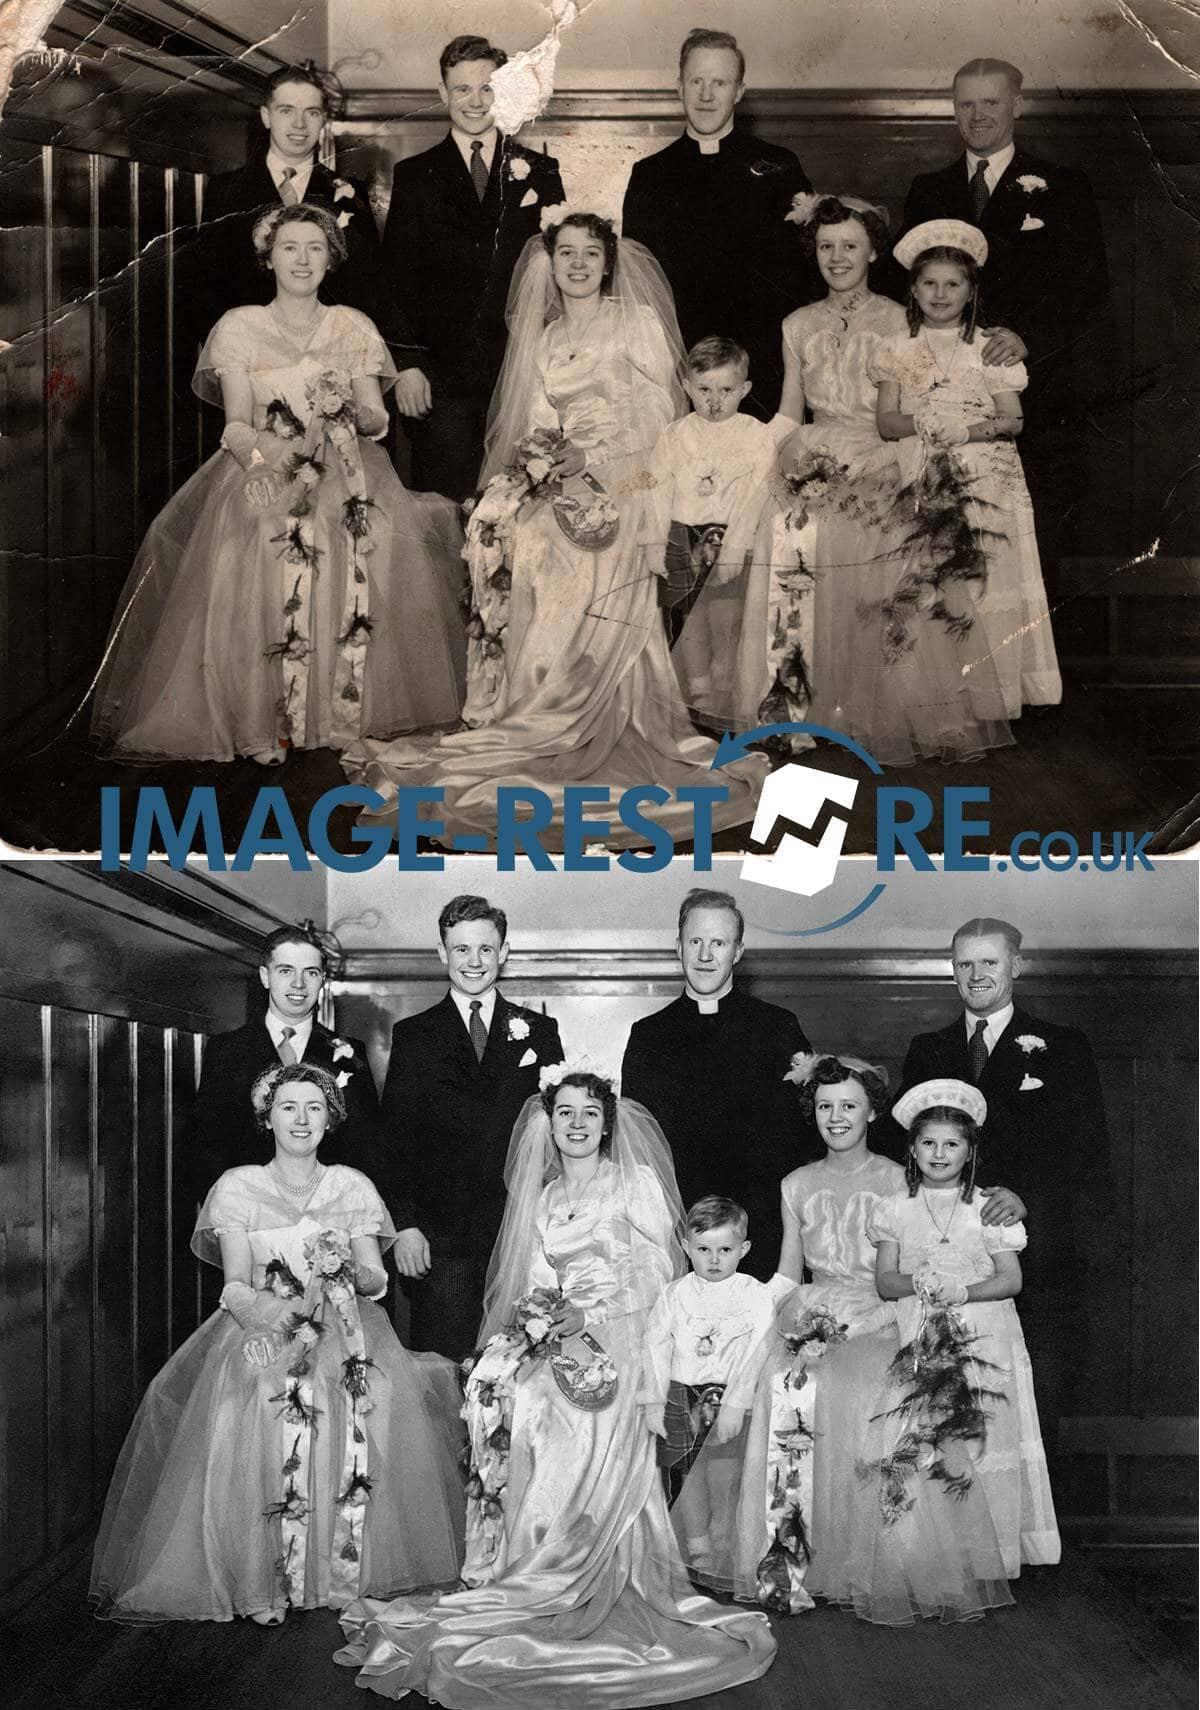 Harry Haddock Wedding 1952 photo restoration